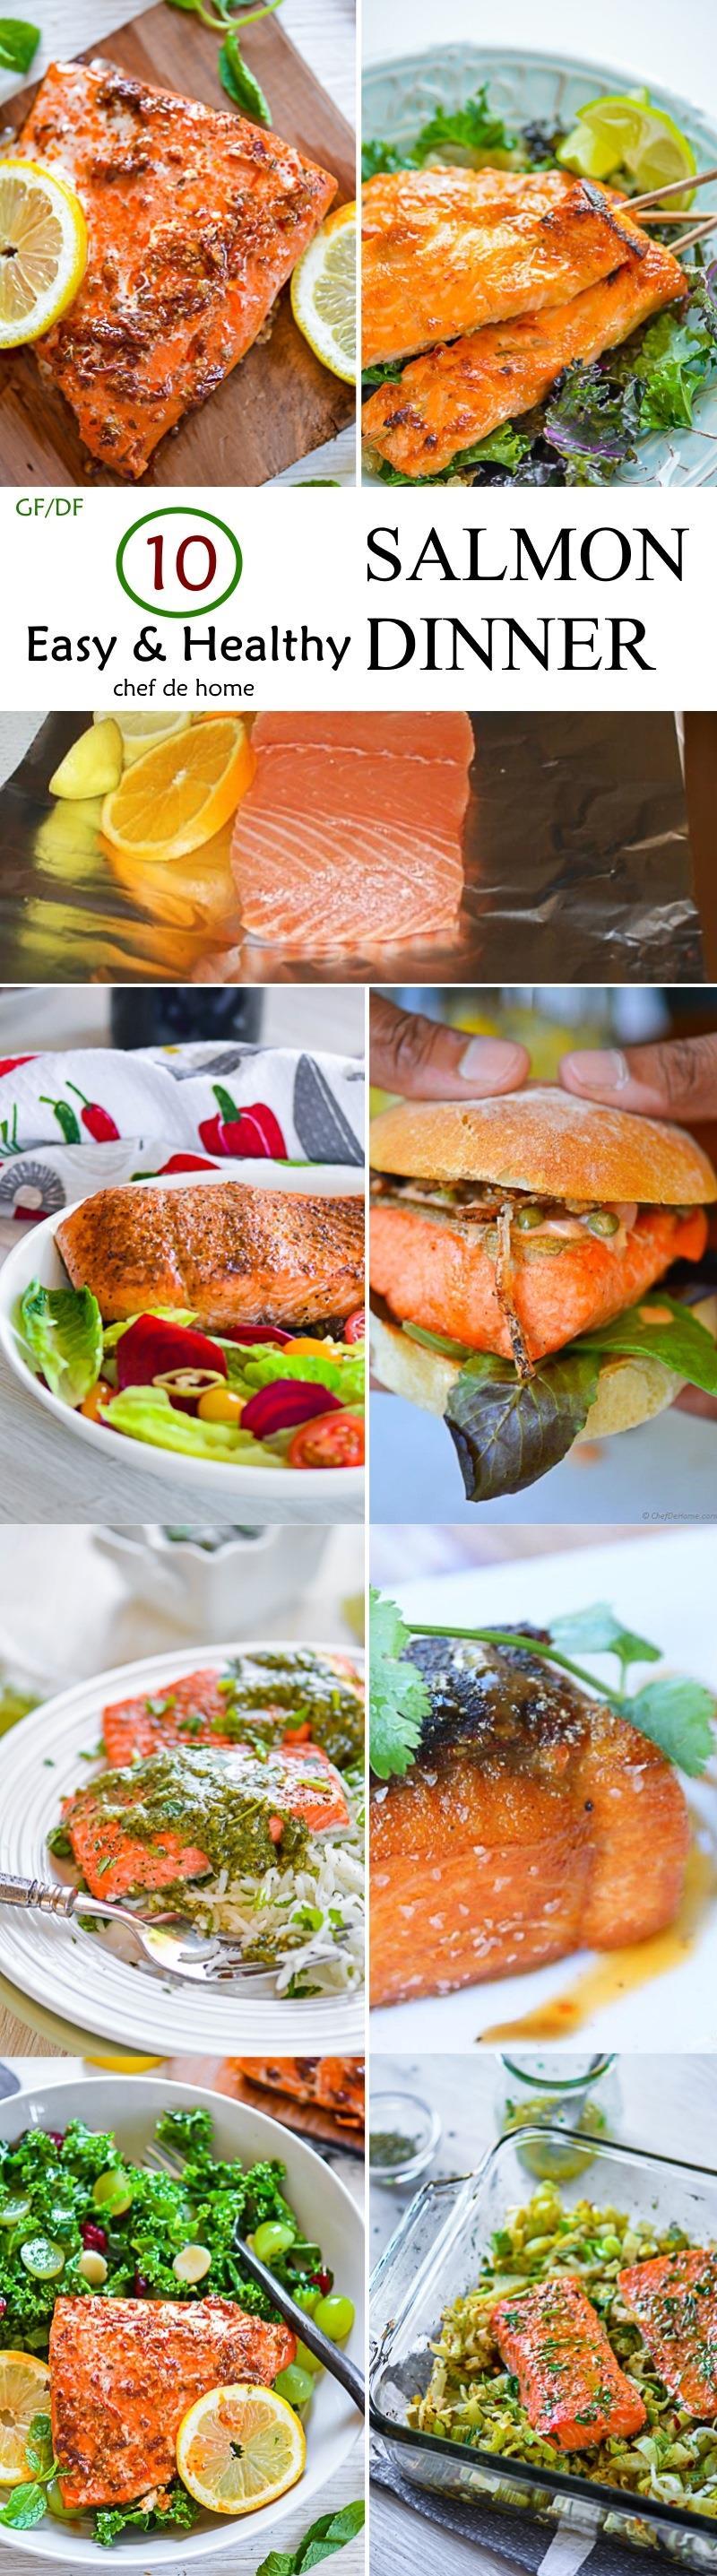 Healthy easy salmon recipes